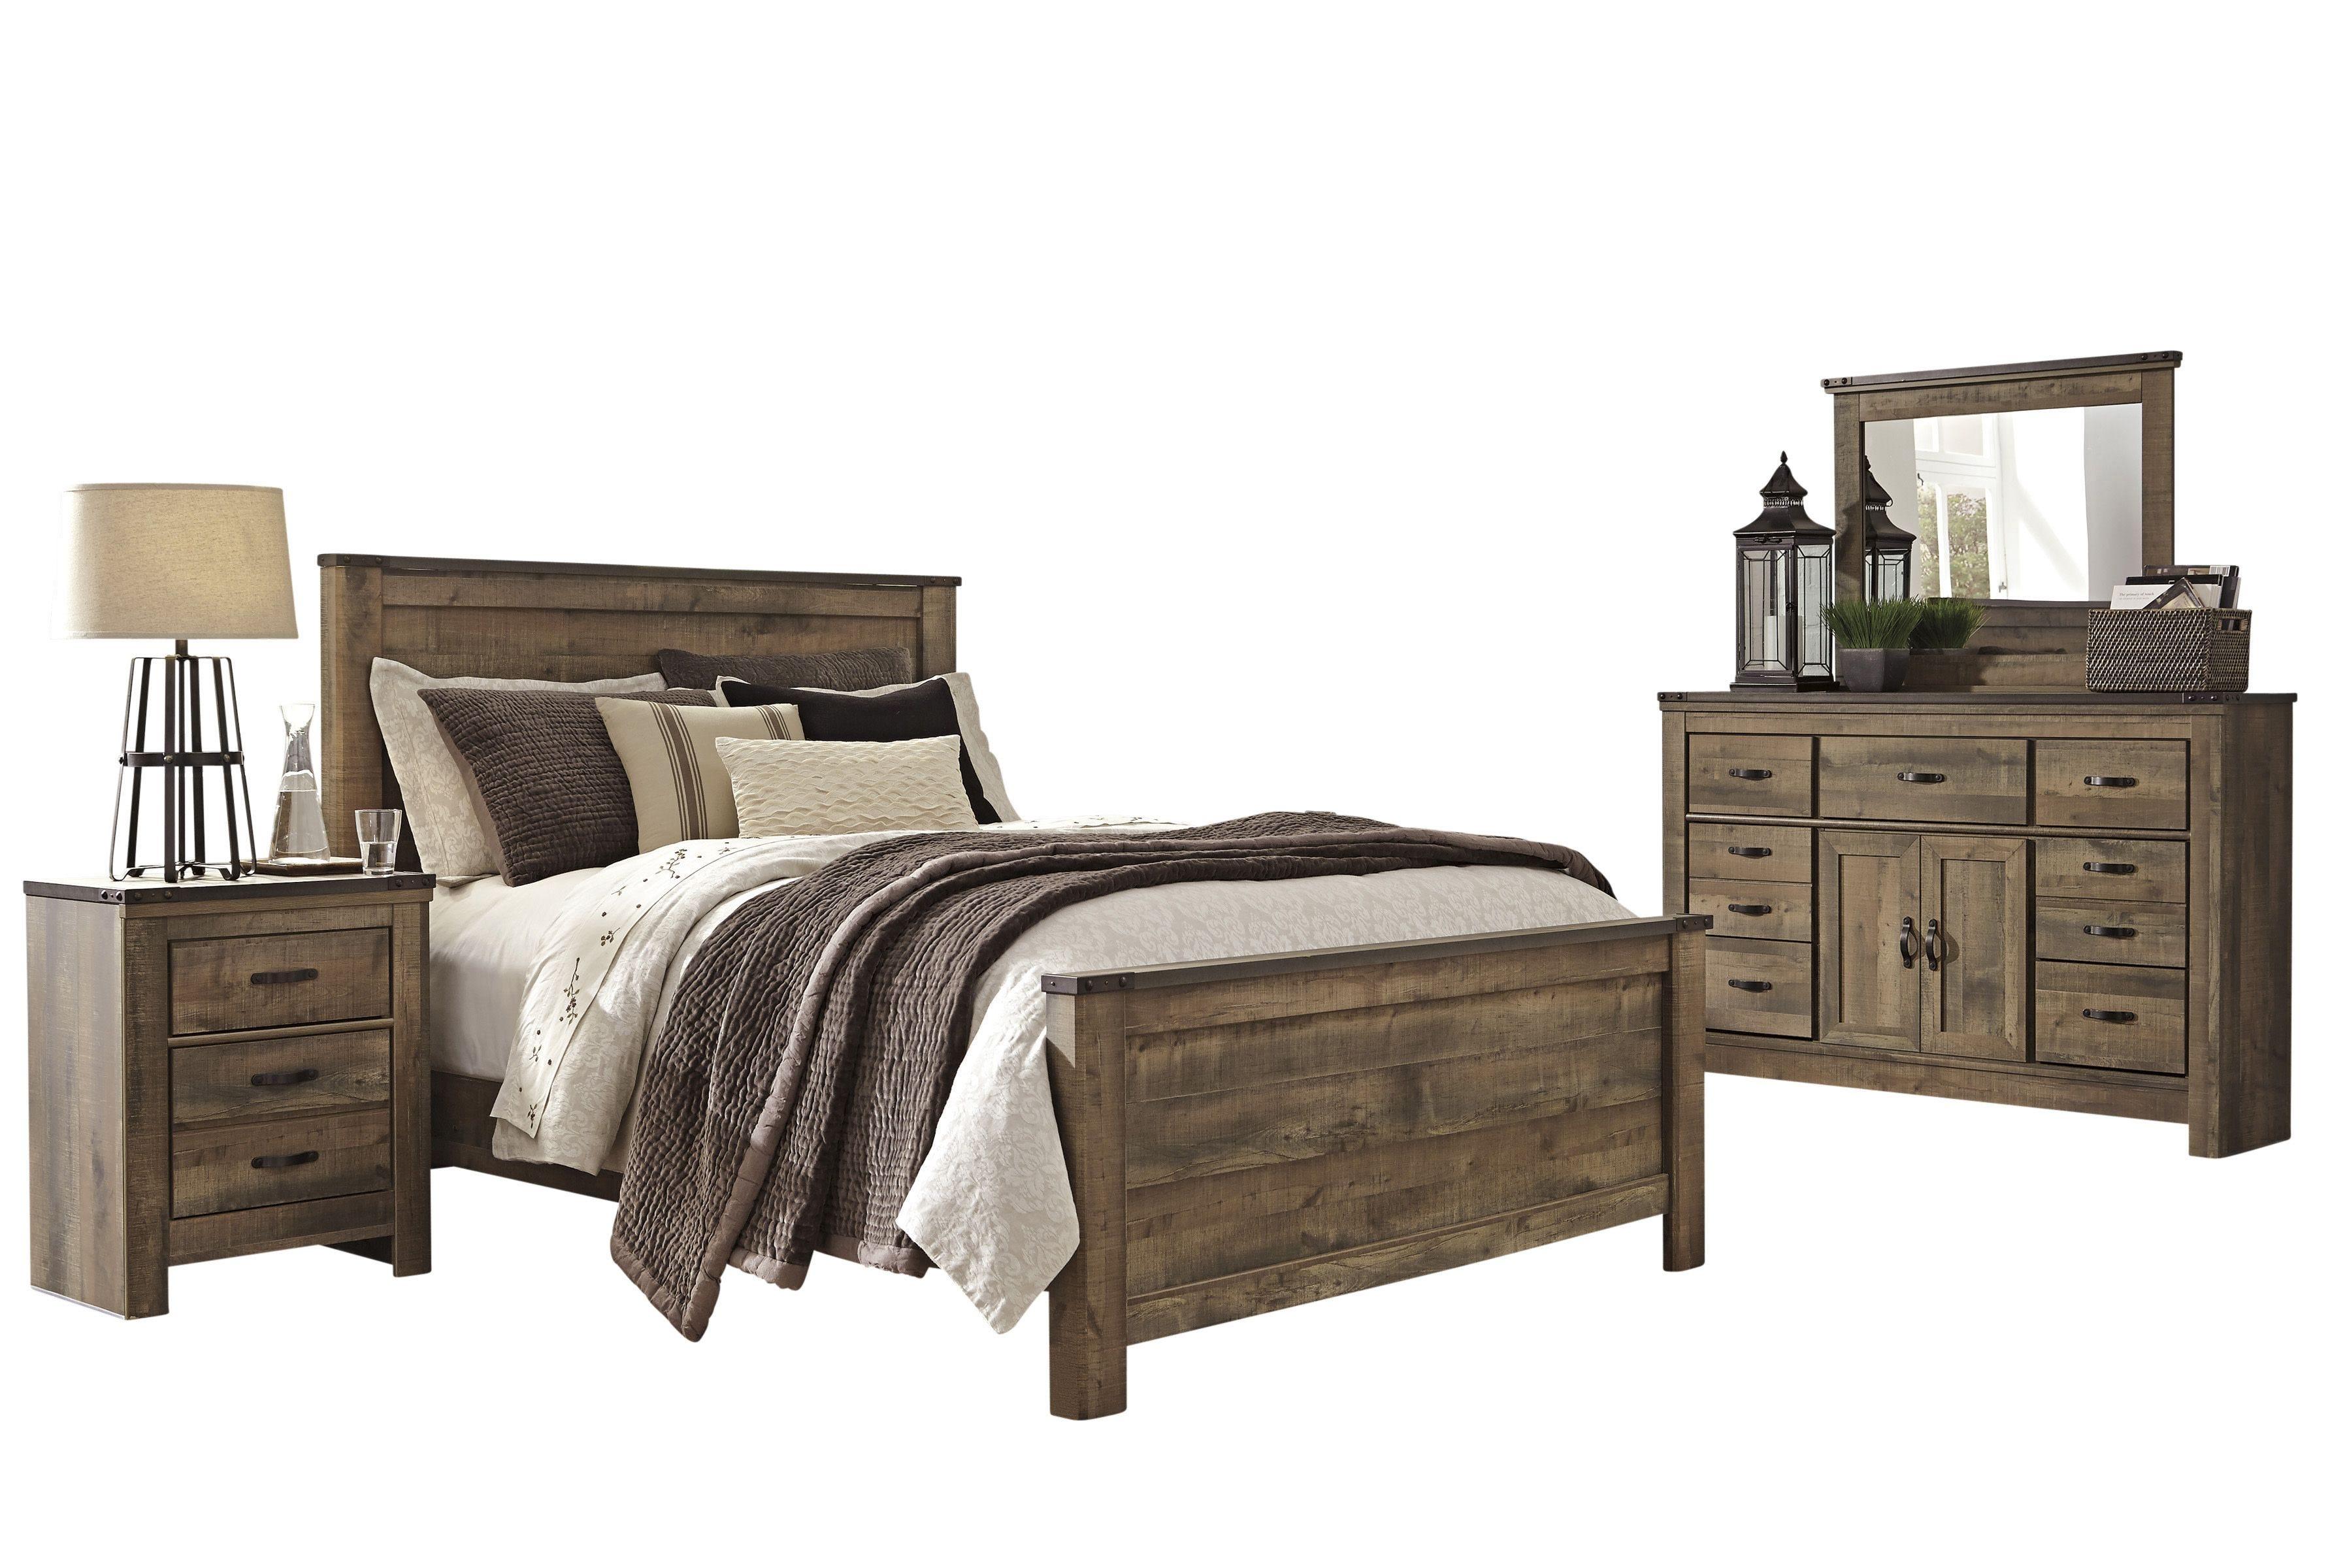 Trinell Queen 6pc Bedroom Set Tepperman S